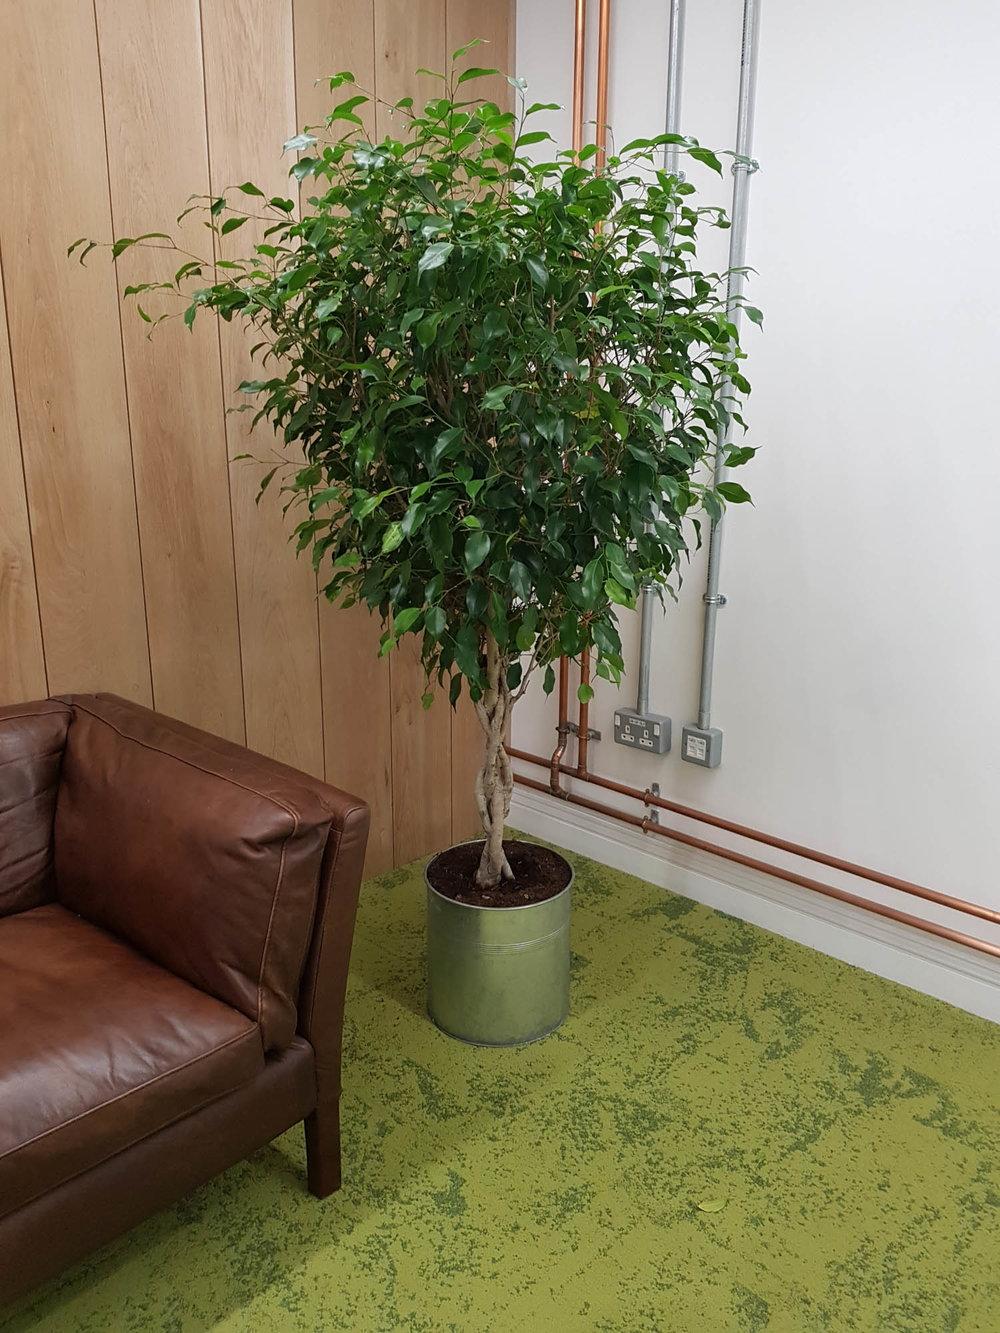 cookpad-interior-plants-mosswalls-branded-planters-plantcare-bristol-image-5